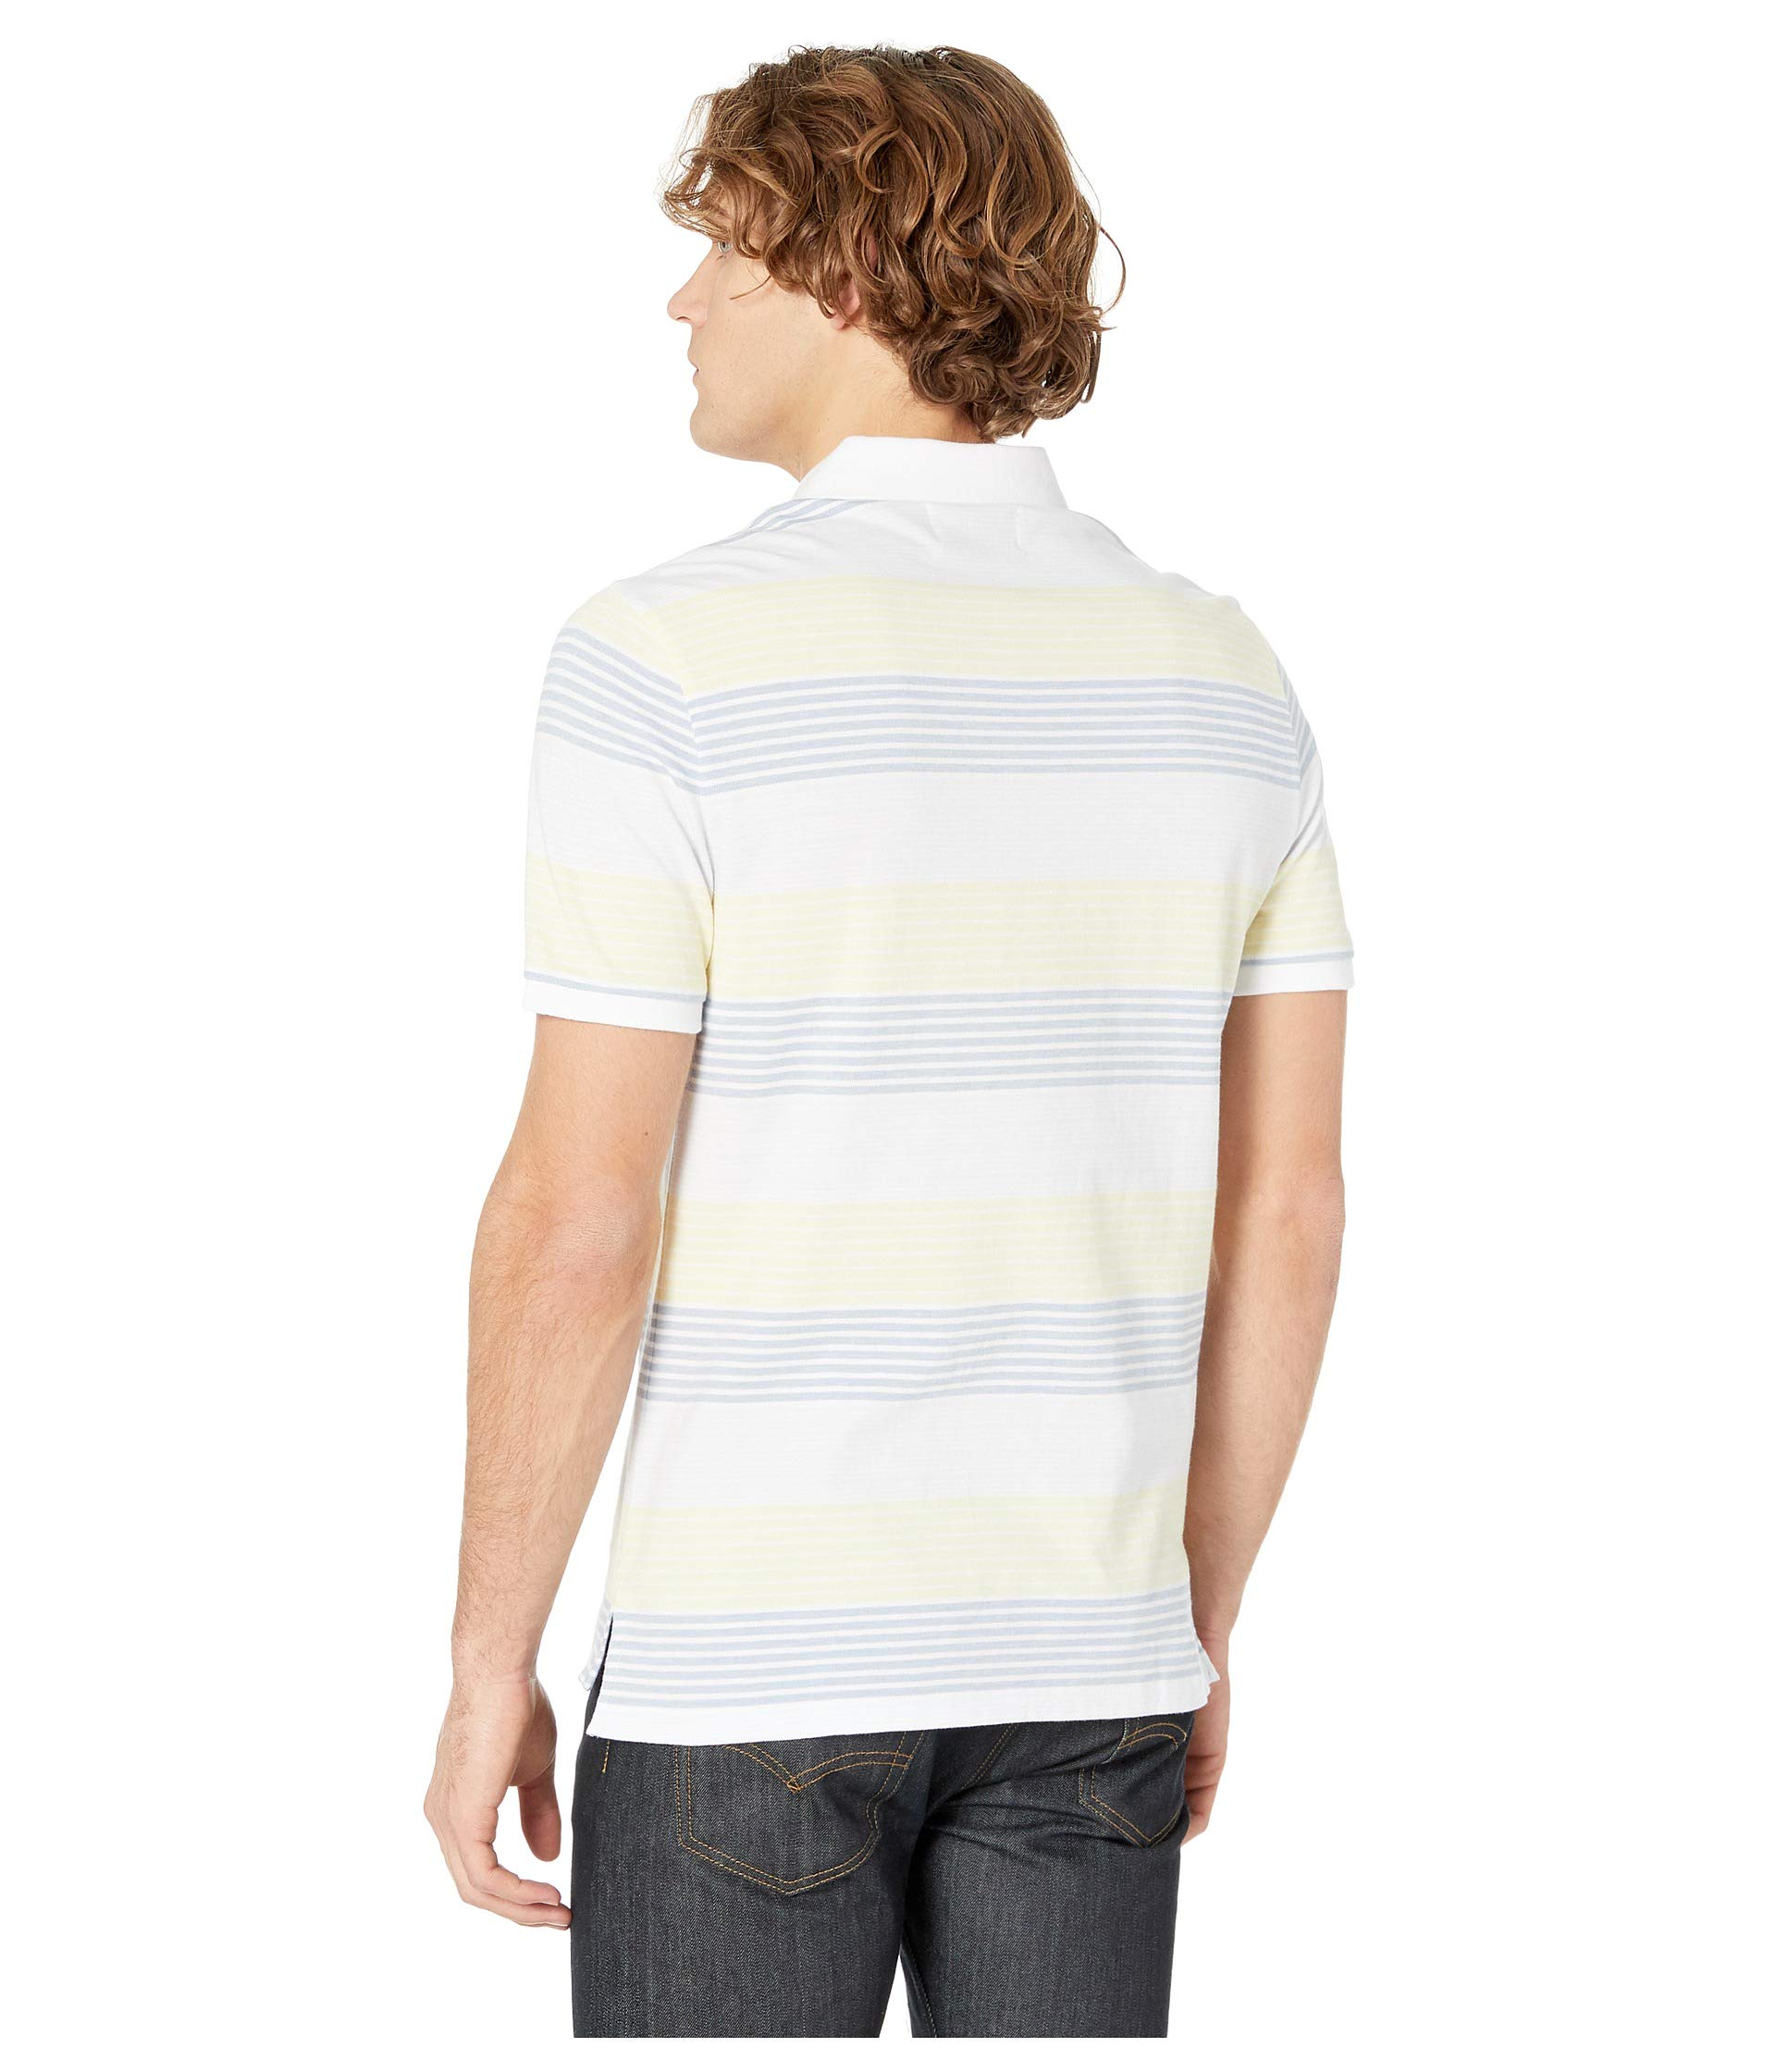 Short Sleeve Original Bright White Polo Engineer Penguin Stripe 8qxT5Bw